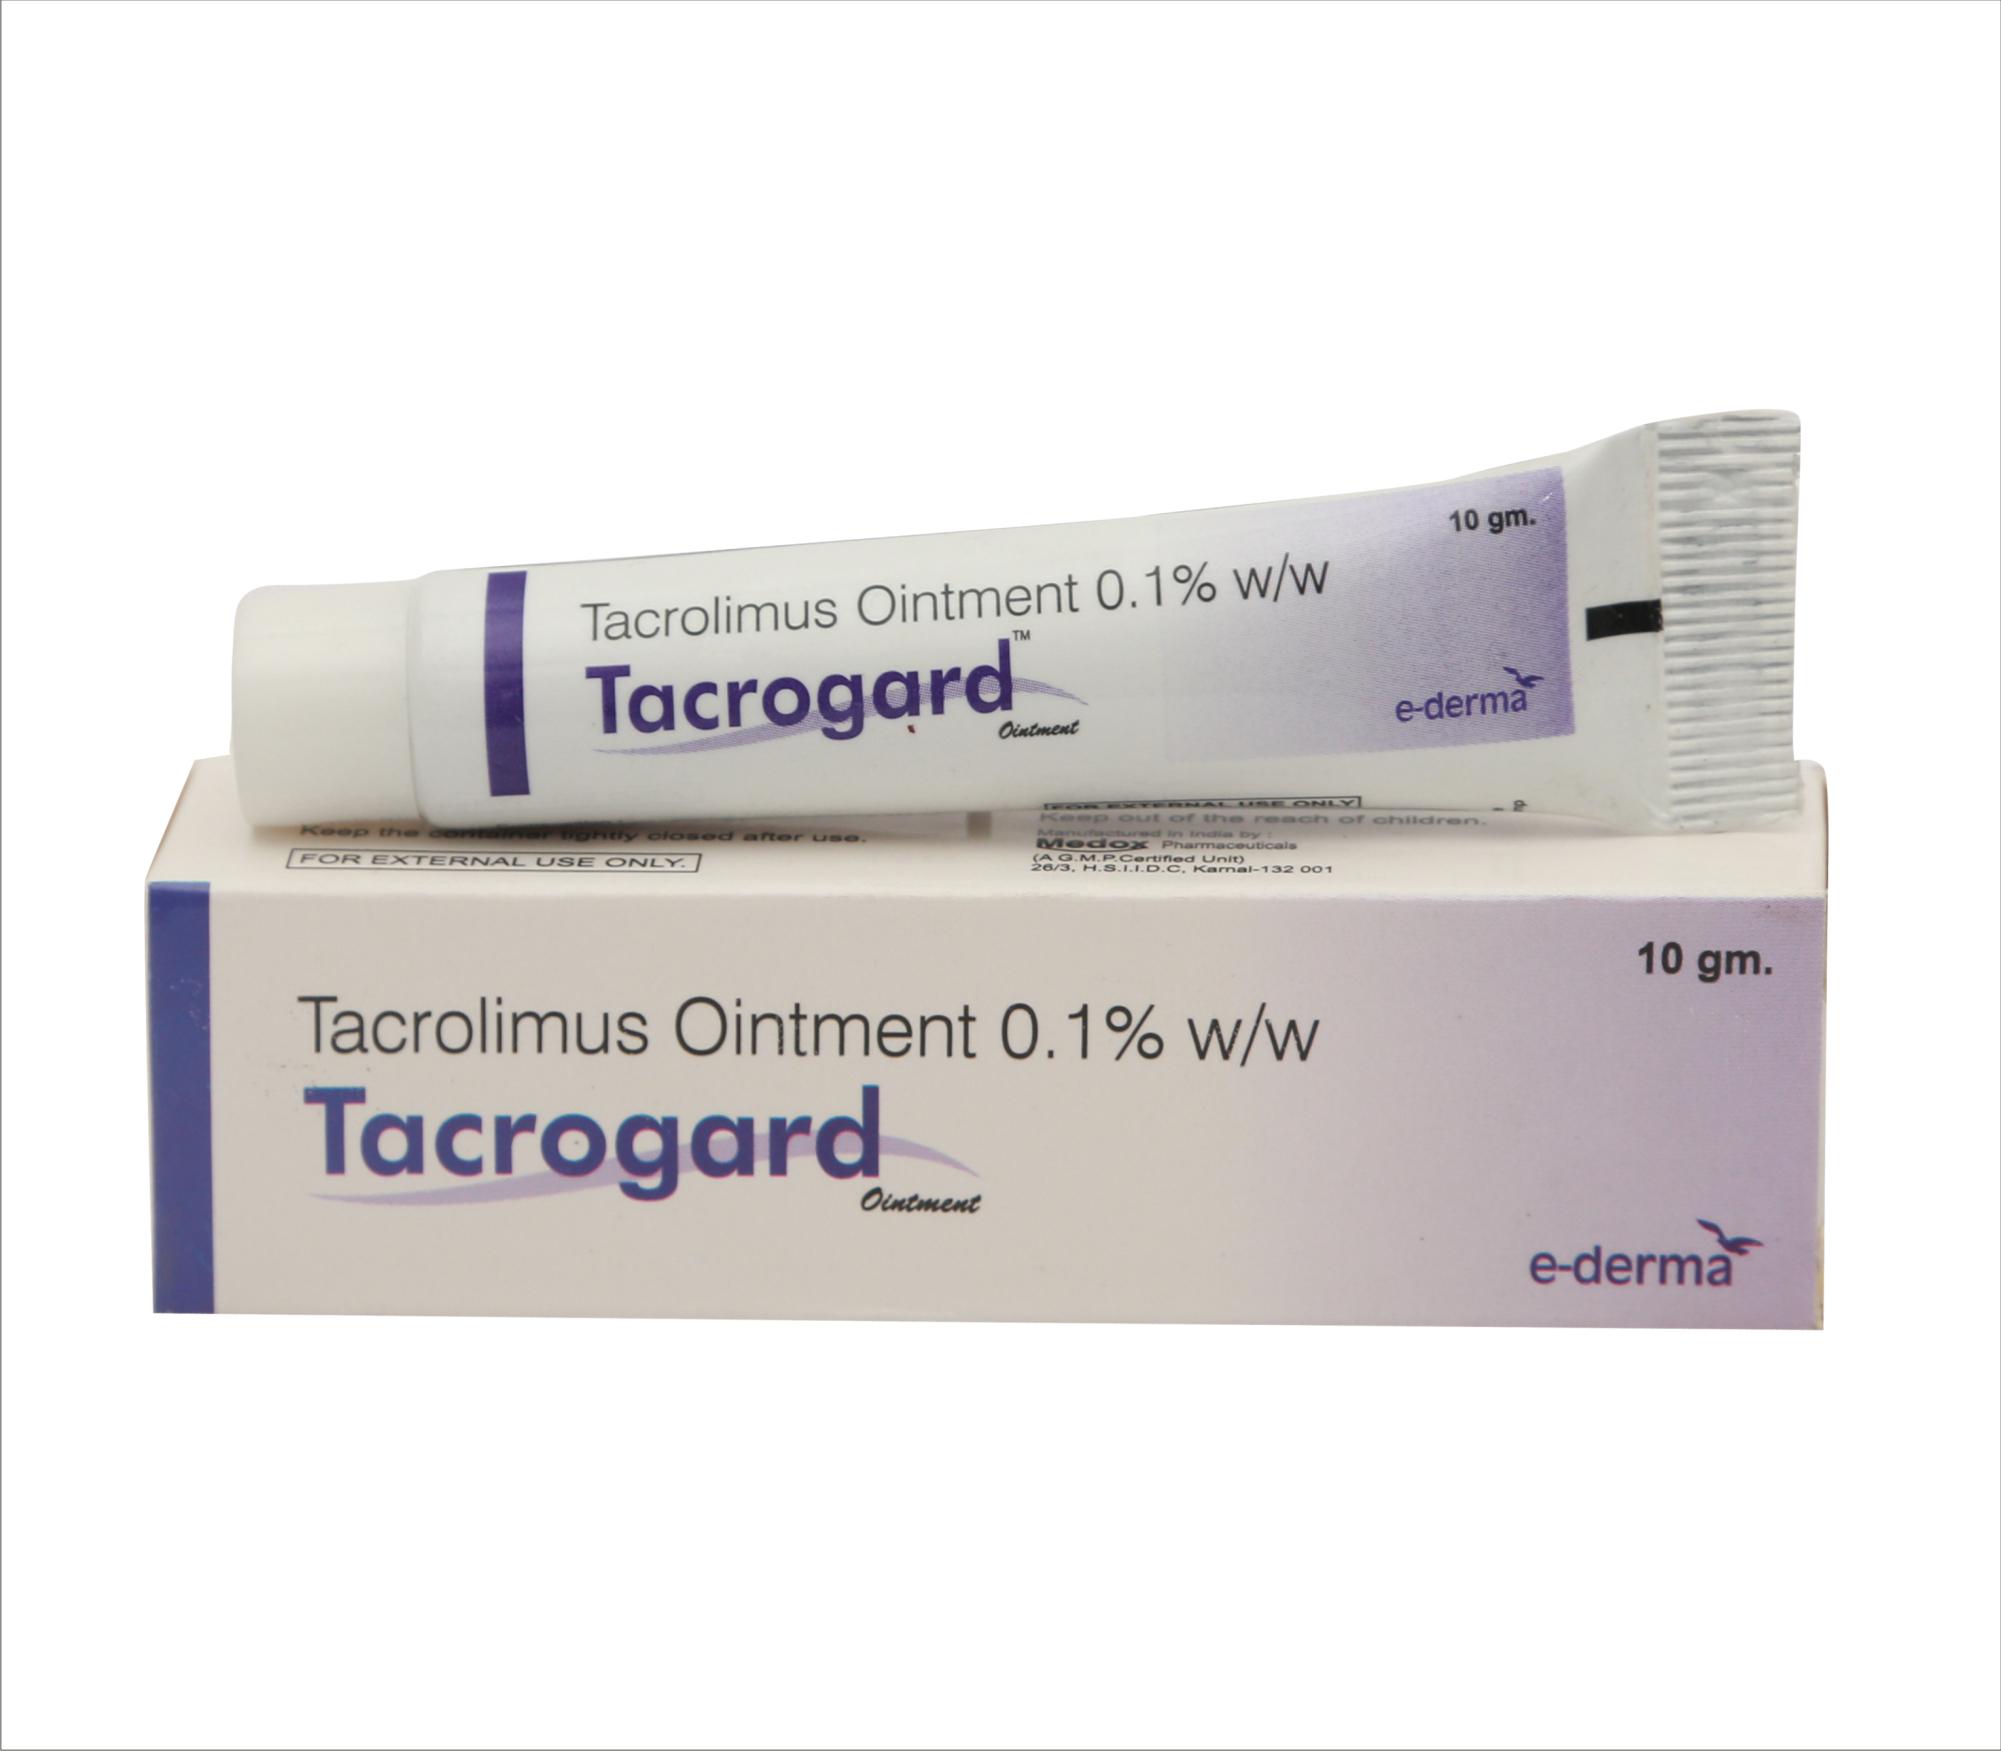 Tacrolimus Ointment